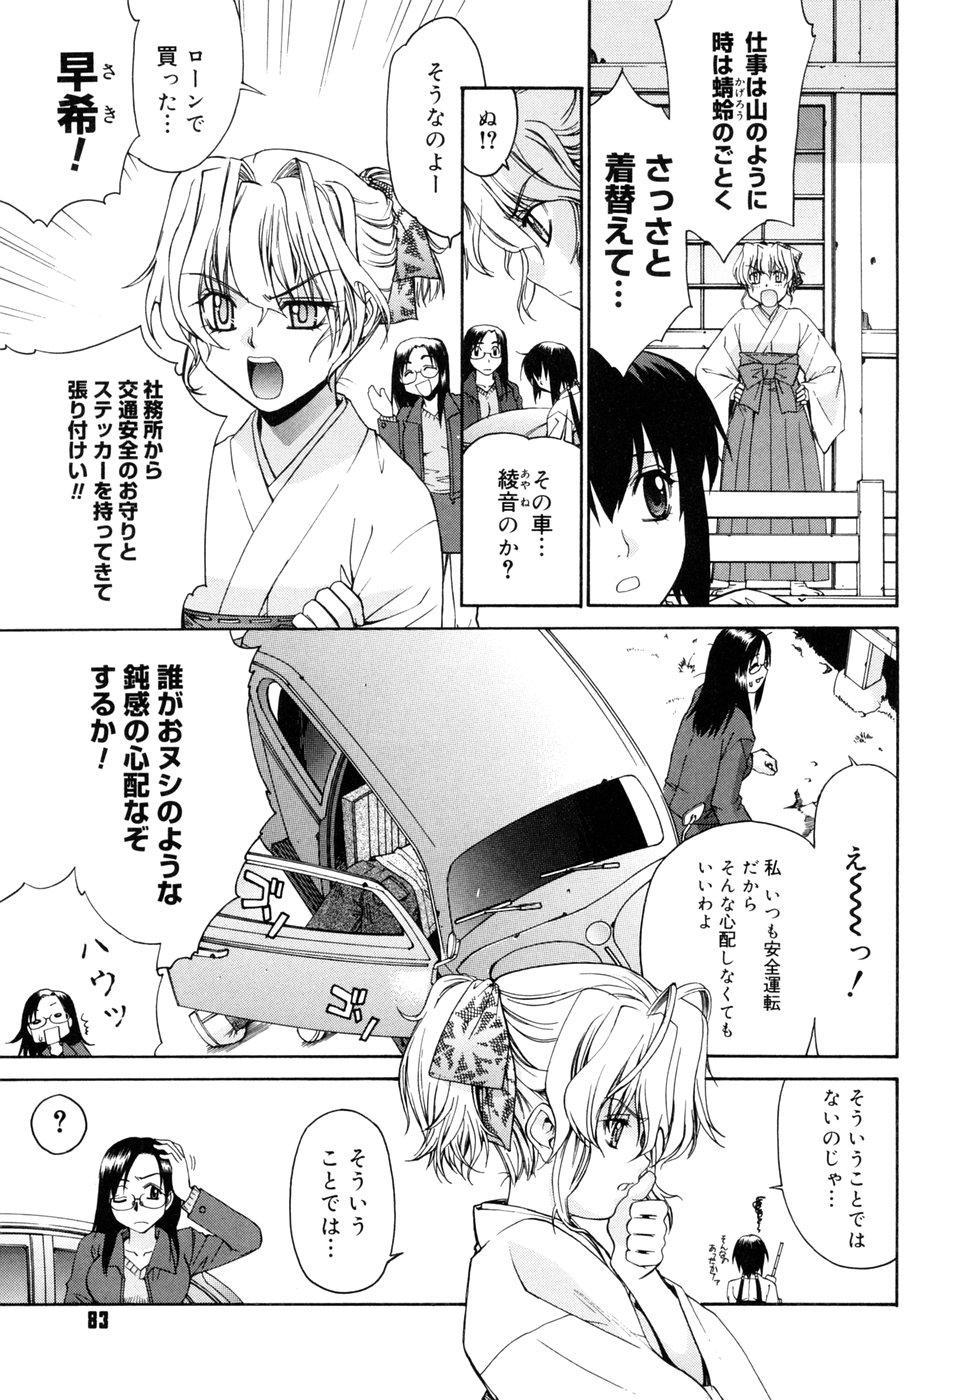 [Yaya Hinata] Tonari no Miko-san wa Minna Warau - The next shrine maidens smile in everyone. 82